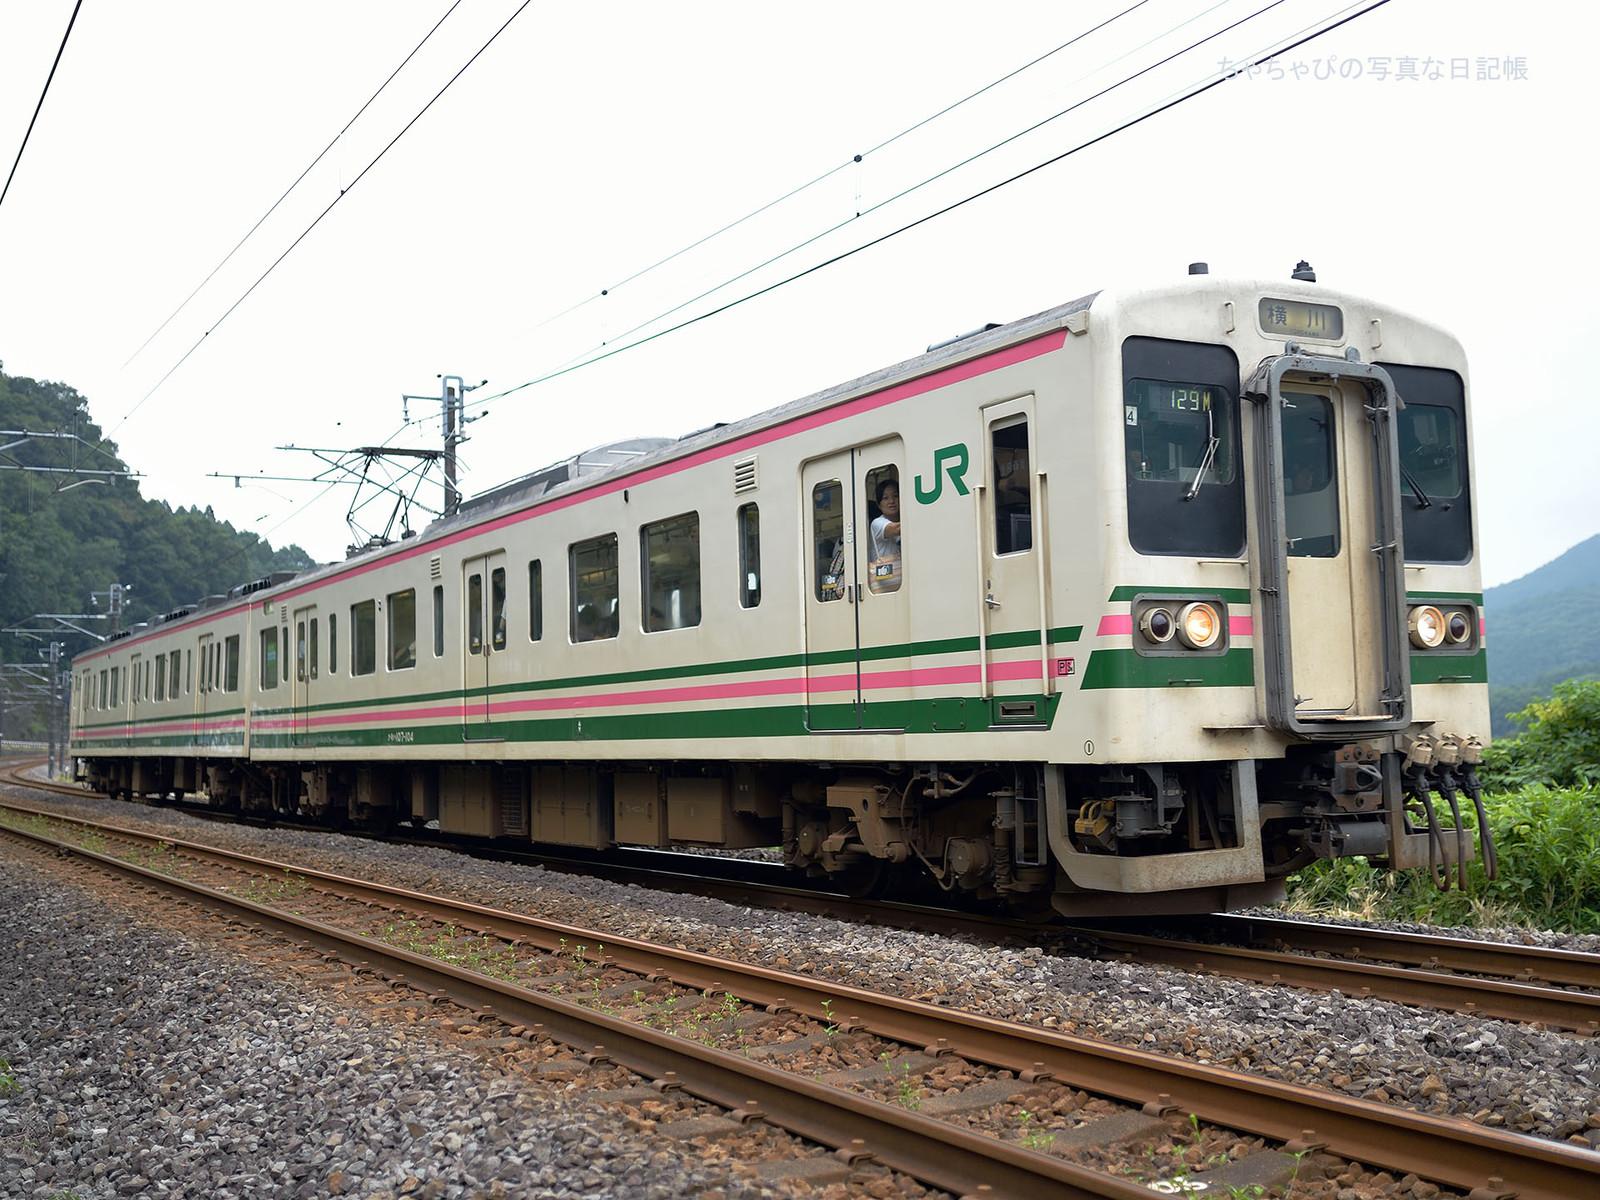 JR東日本 信越本線 西松井田駅~横川駅 107系100番台 -R4編成-